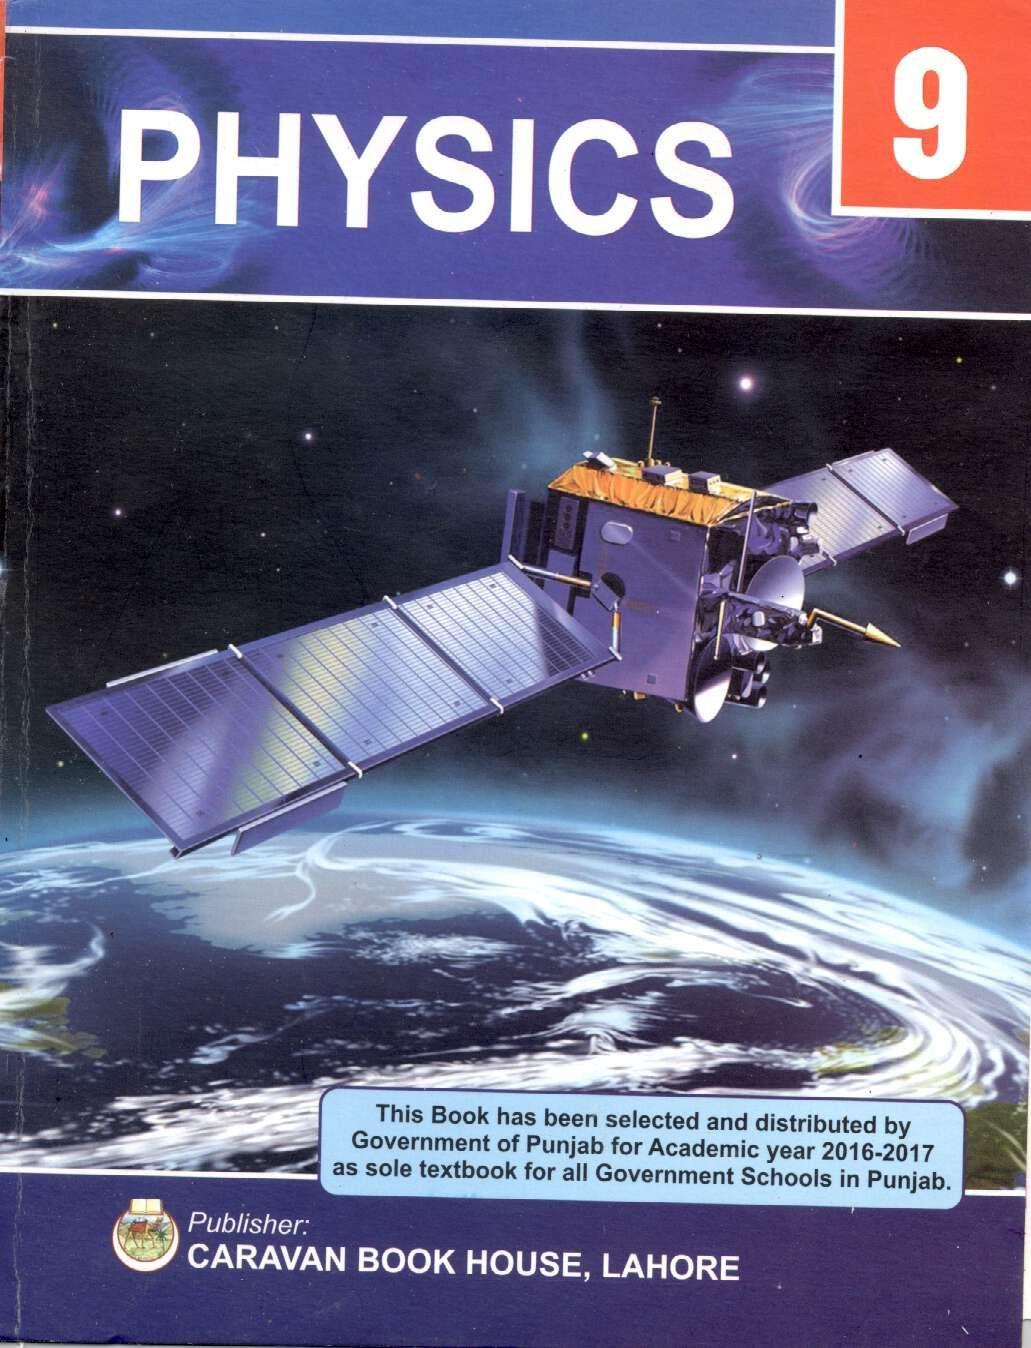 Physics 9th Class Book English Medium Free Download In 2021 Physics Textbook Physics Books Class Book